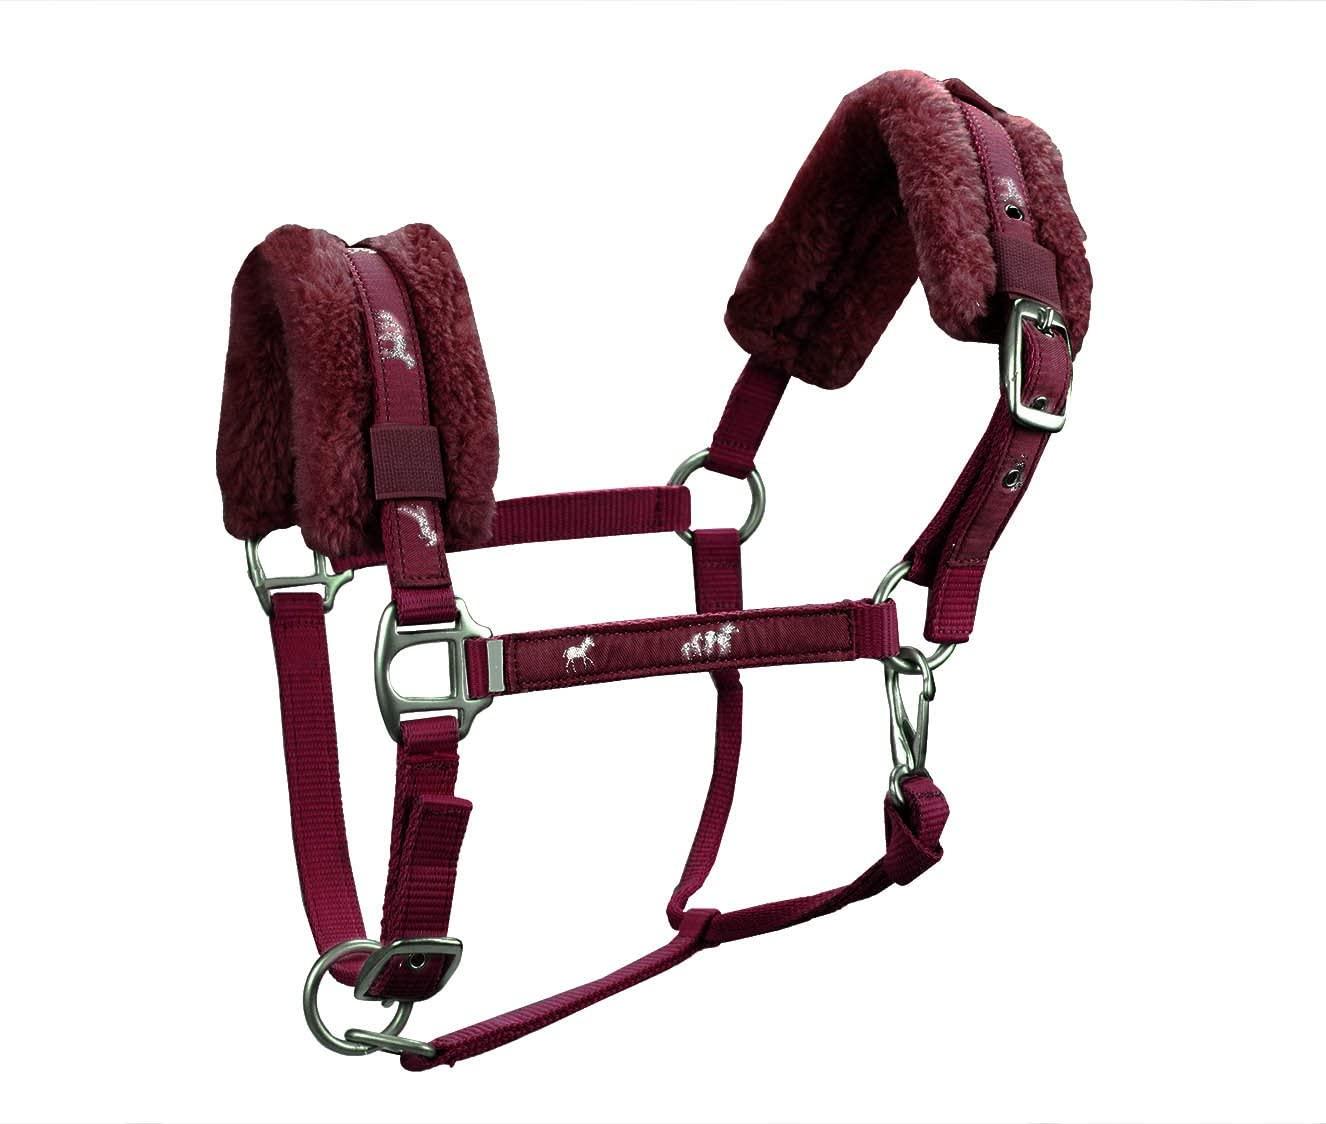 Derby Originals Padded Comfort Nylon Fleece Yearling Horse Halter